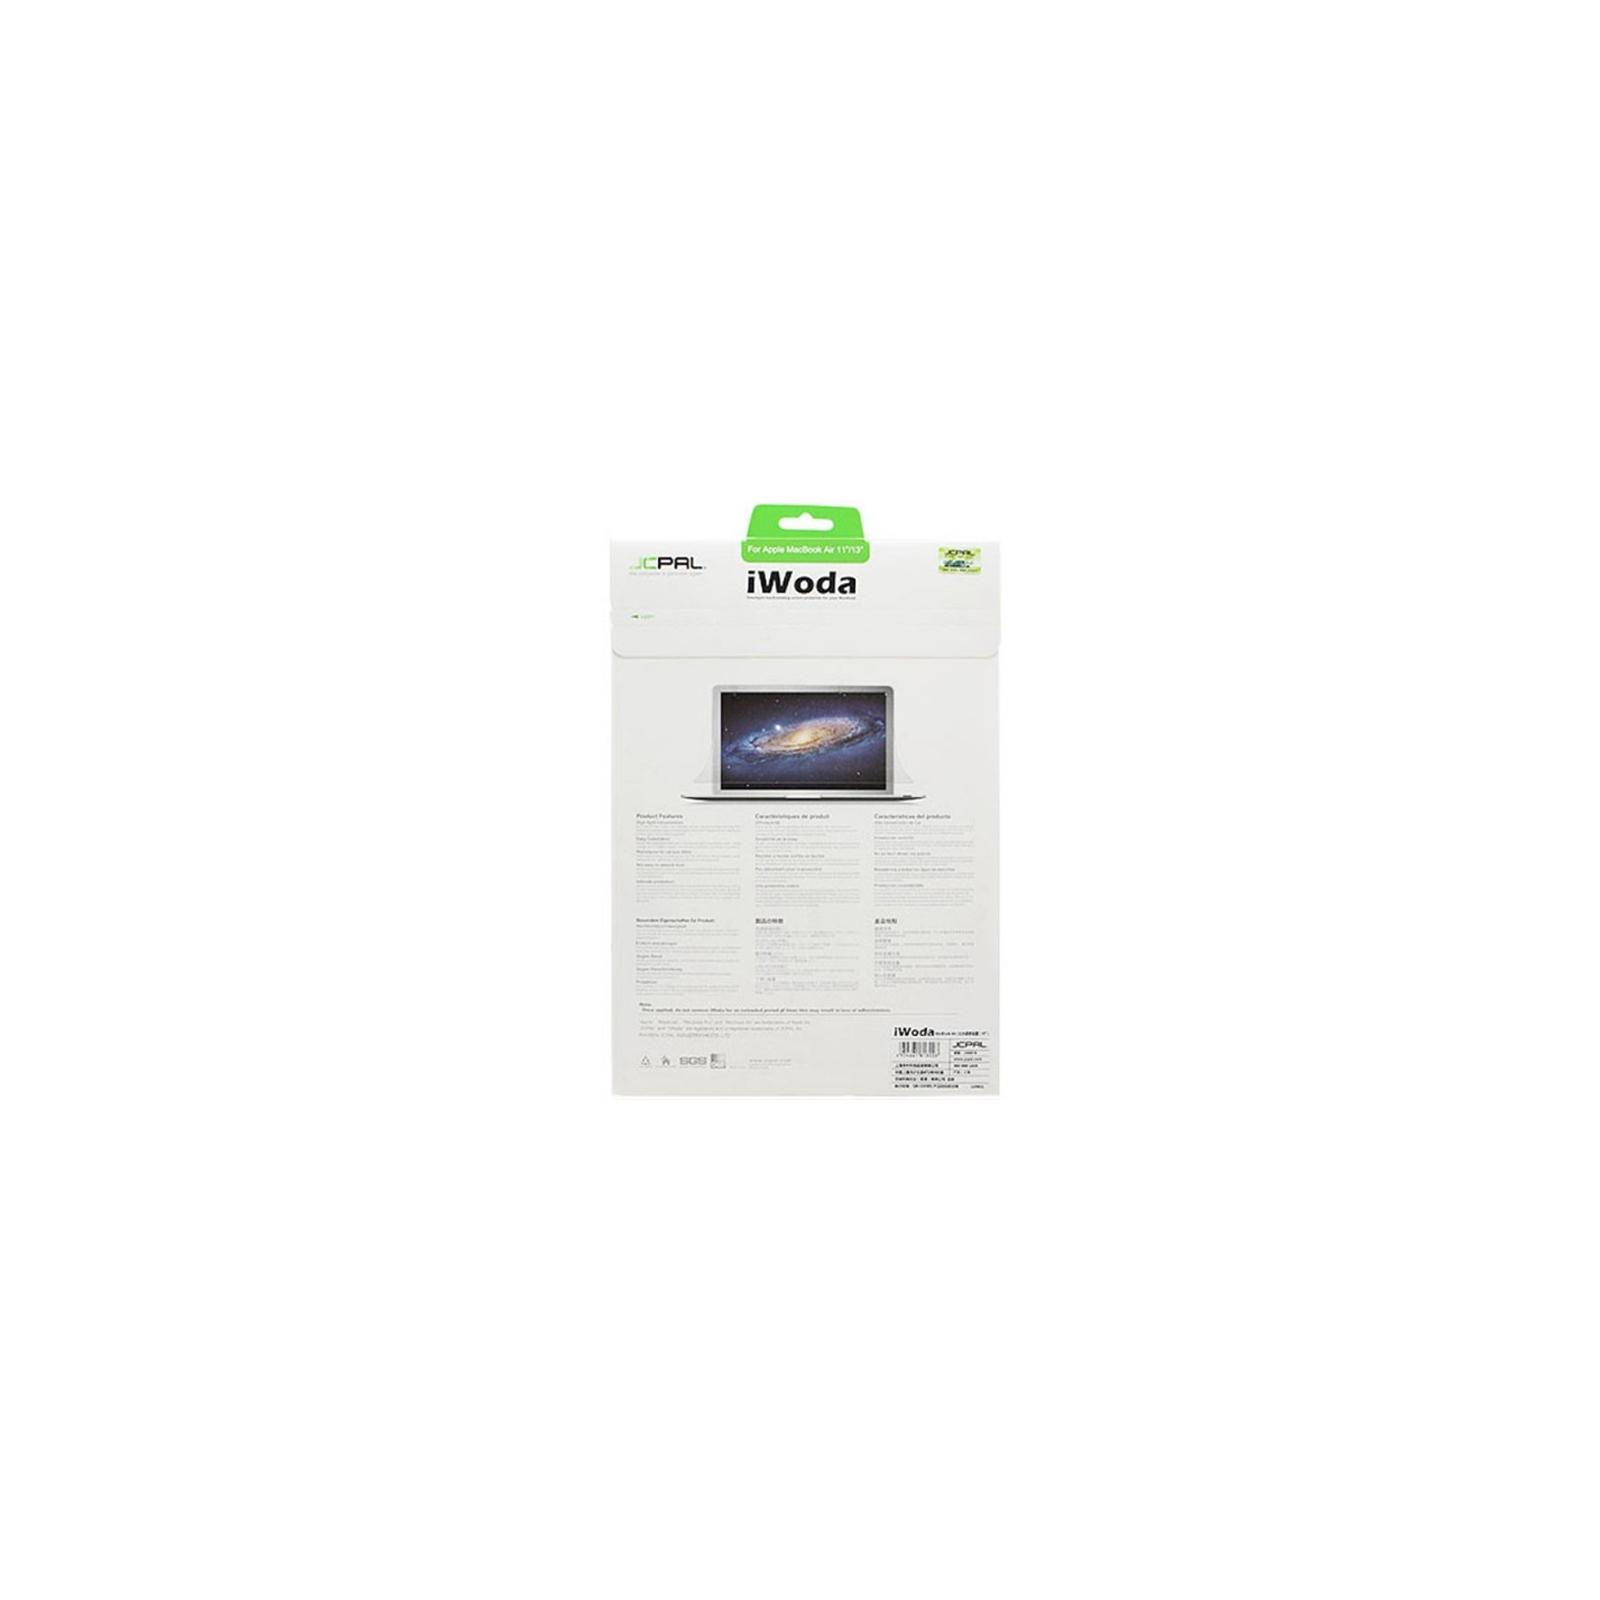 Пленка защитная JCPAL iWoda для MacBook Pro 13 (High Transparency) (JCP2011) изображение 2